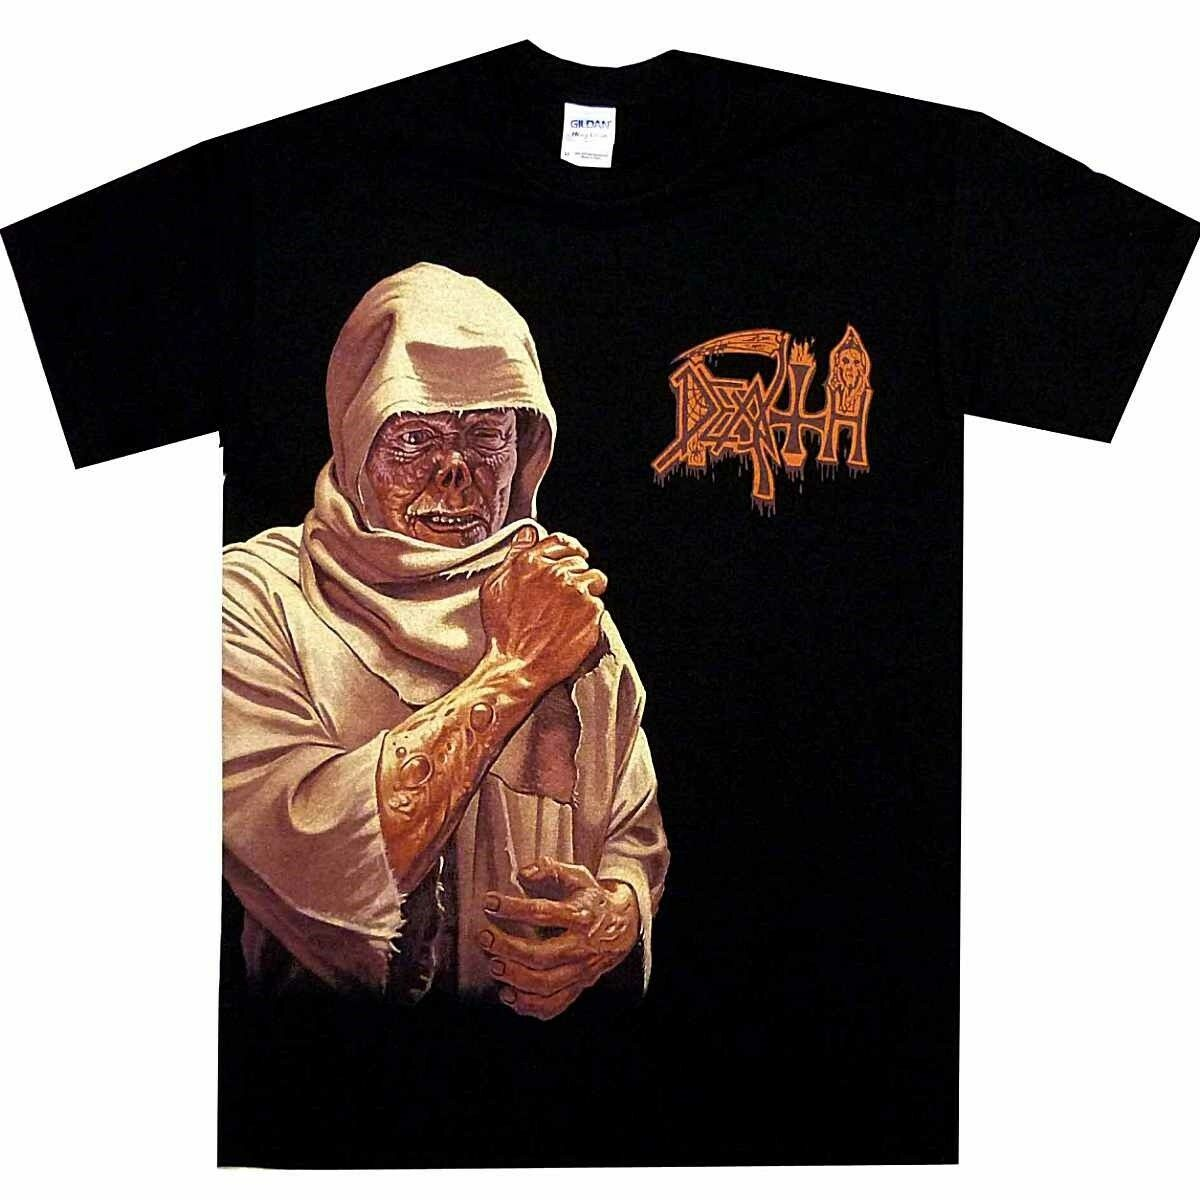 Death Leprosy Leper Side Print Shirt S M L XL Offcl Death Metal T-Shirt Tshirt